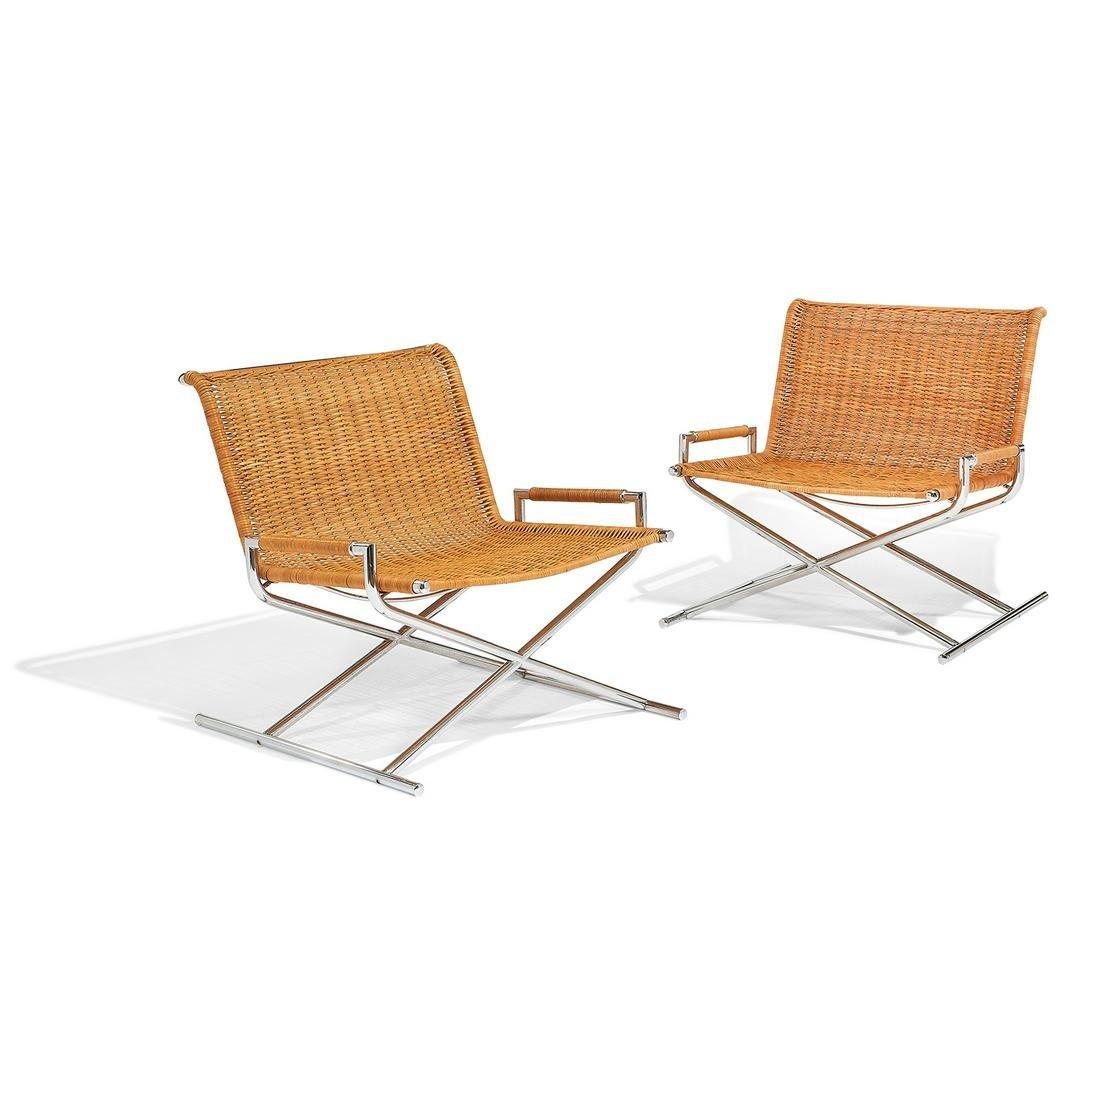 Ward Bennett for Brickell Associates Sled chairs